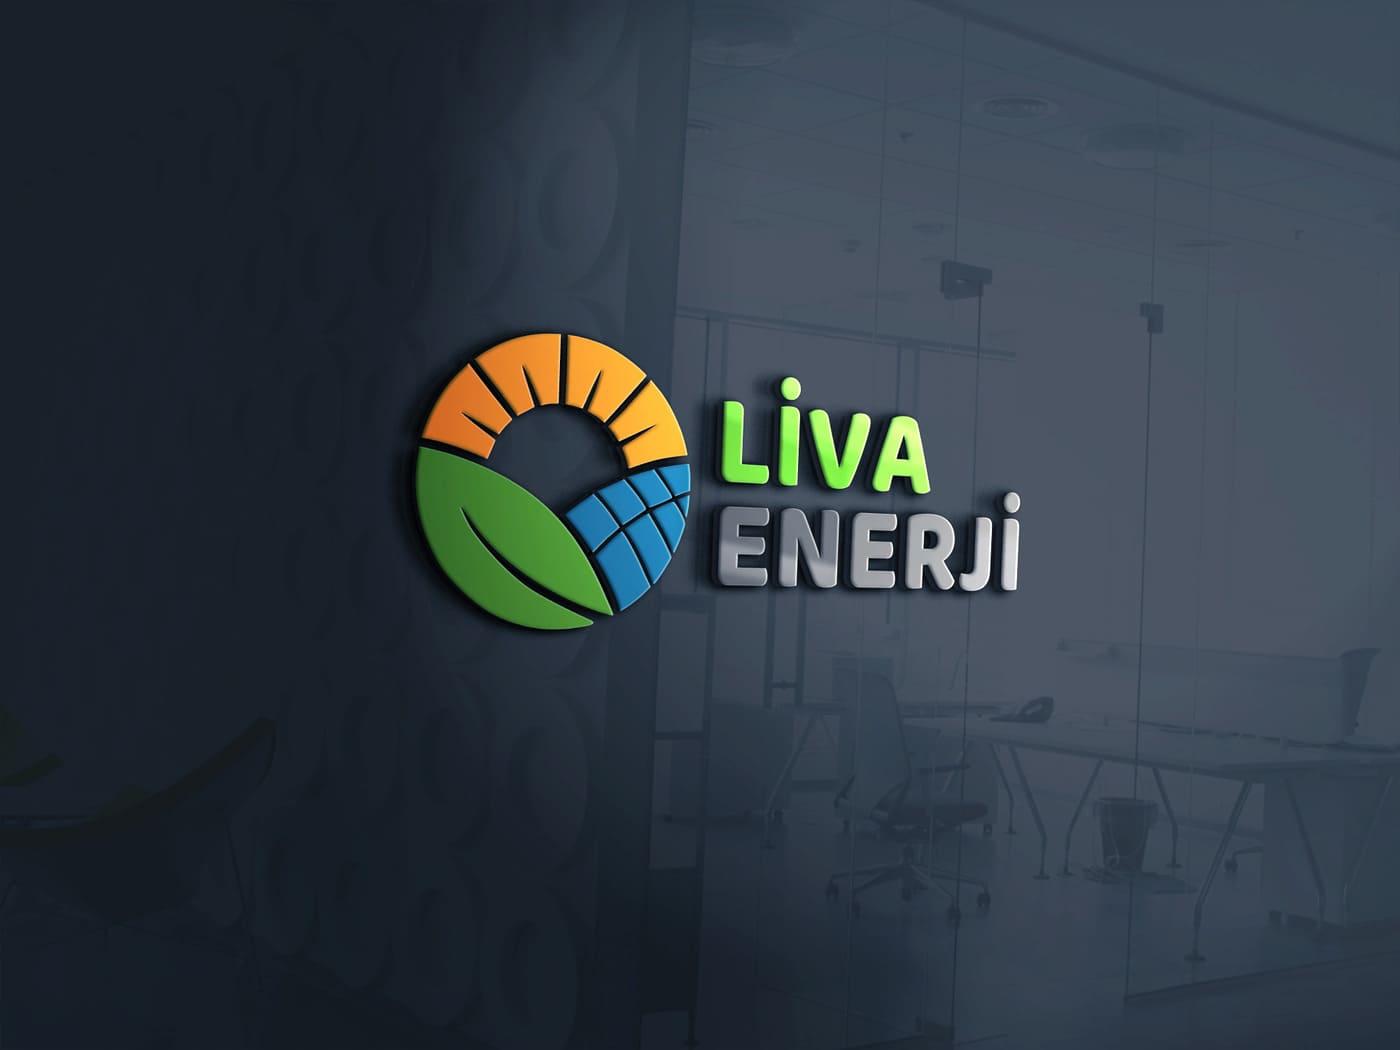 Liva Enerji